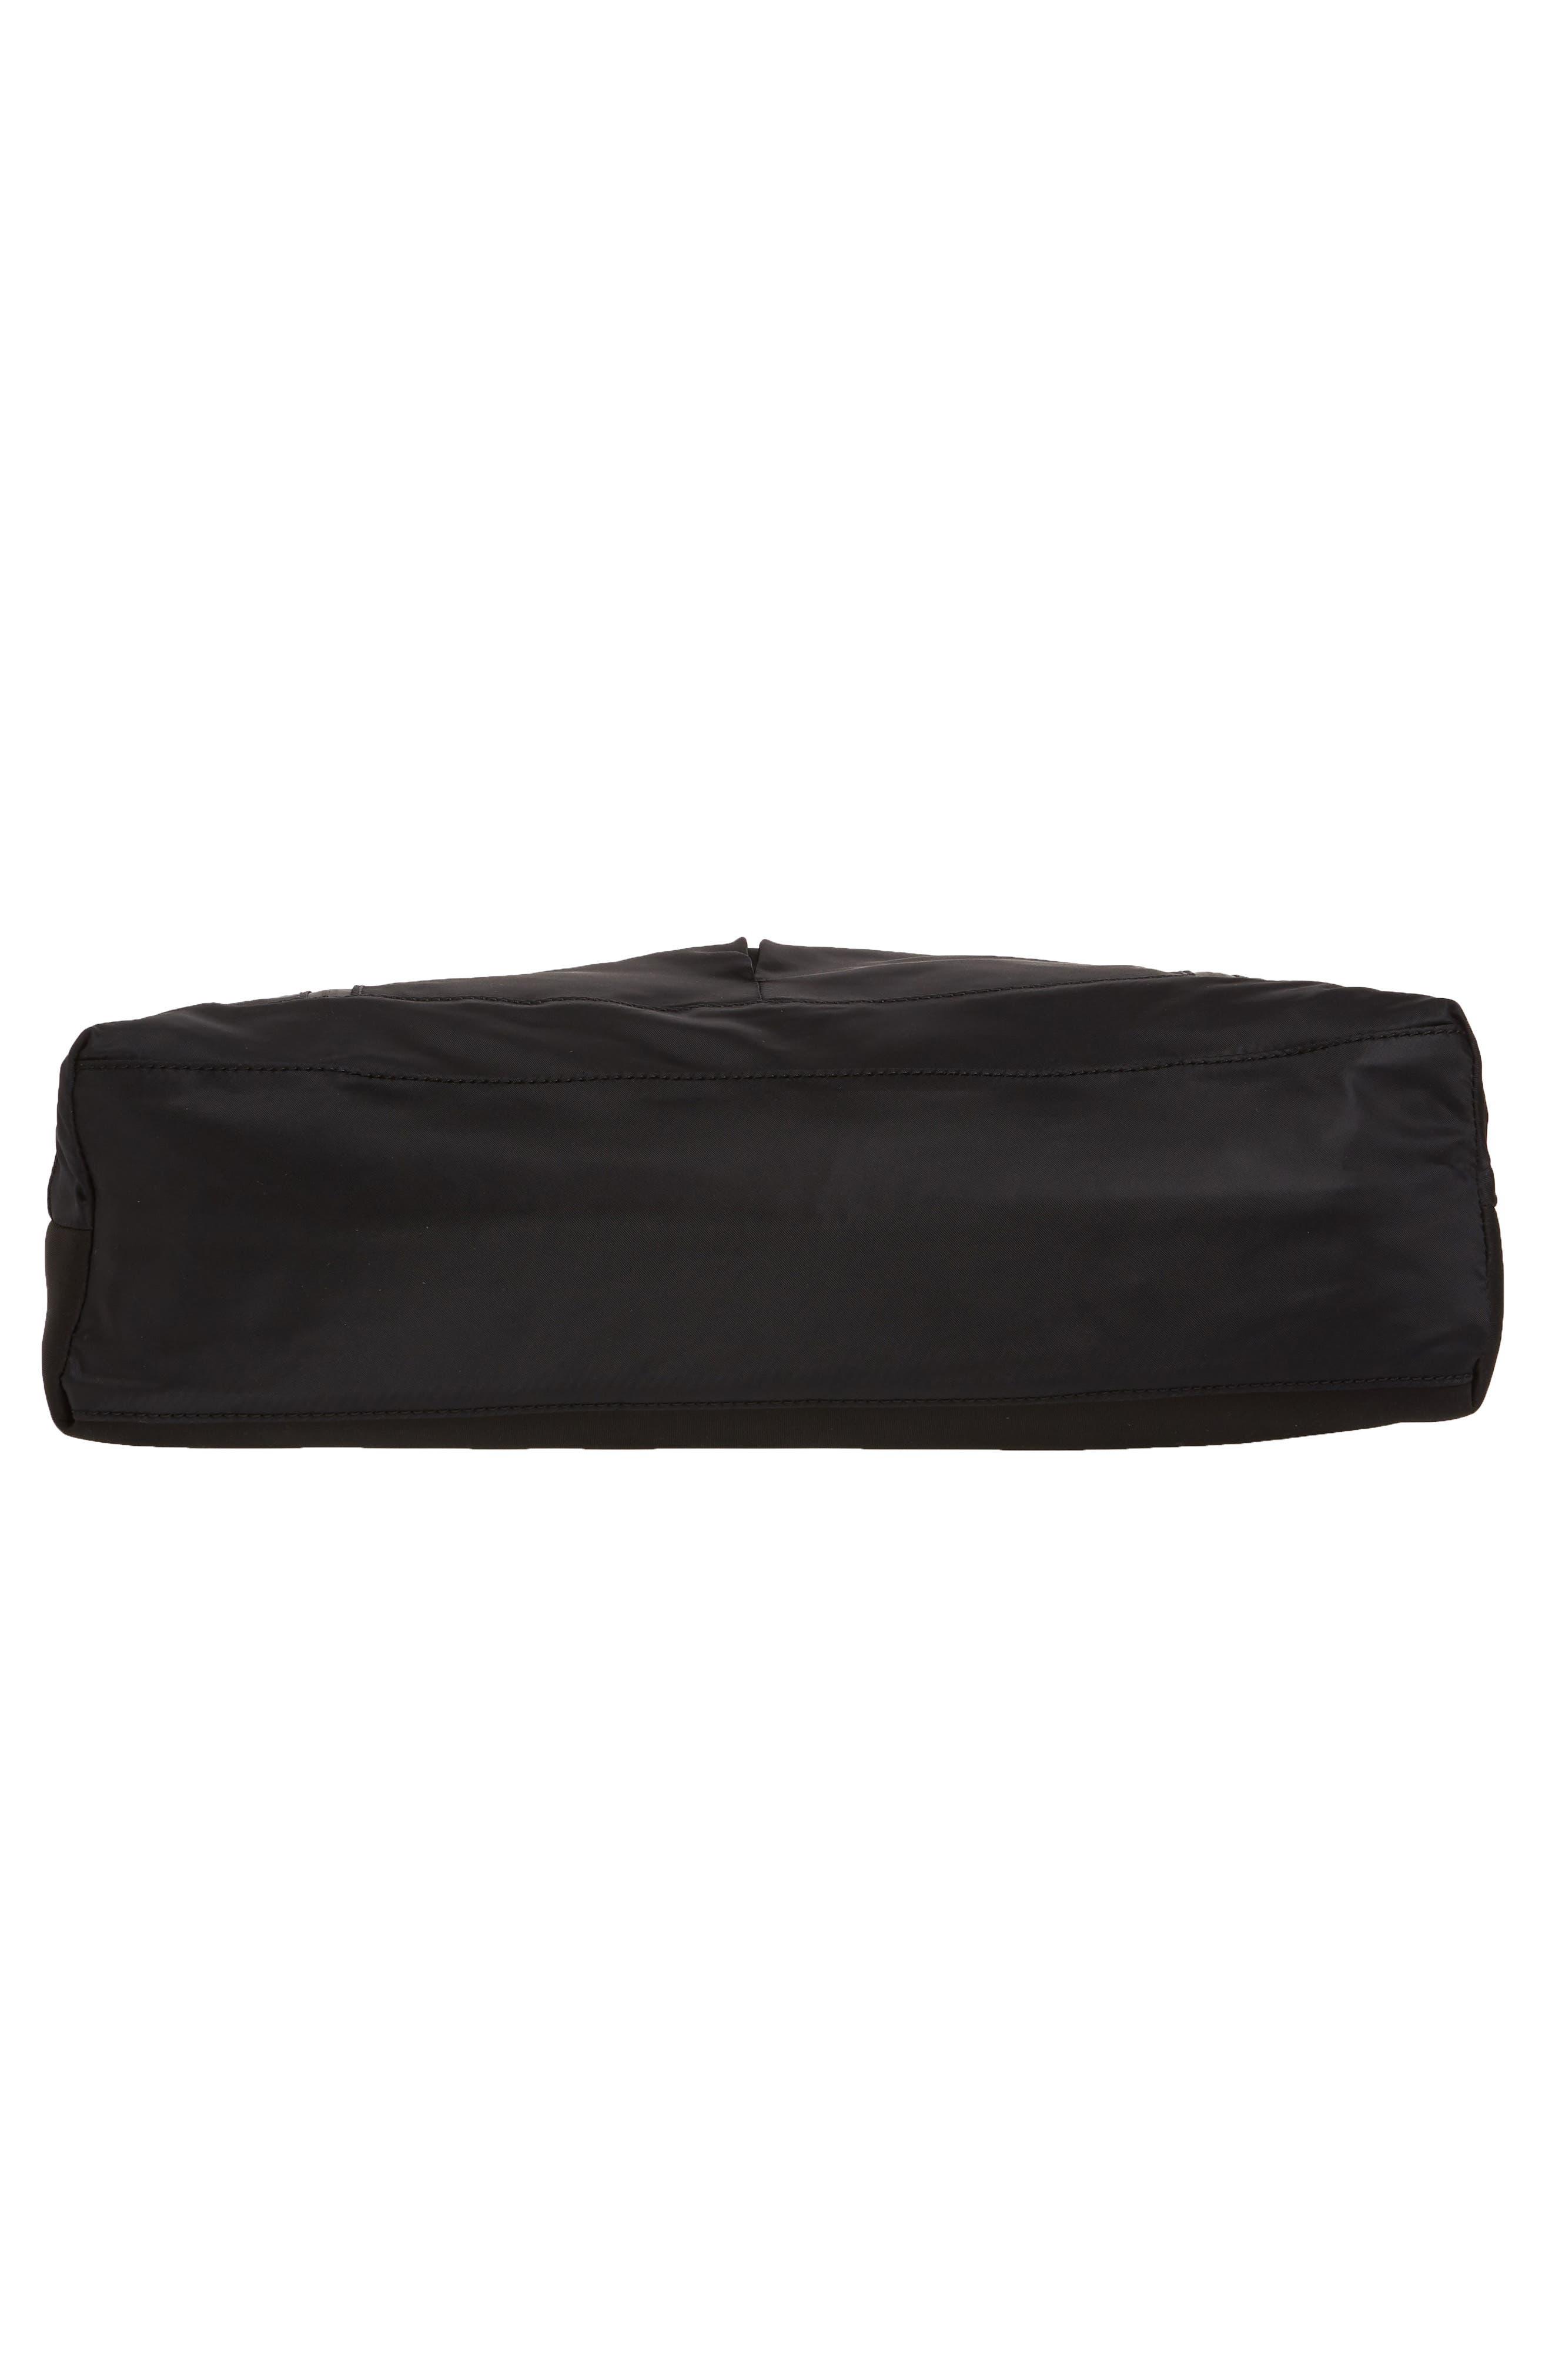 ZELLA, Reflective Nylon Tote Bag, Alternate thumbnail 7, color, BLACK